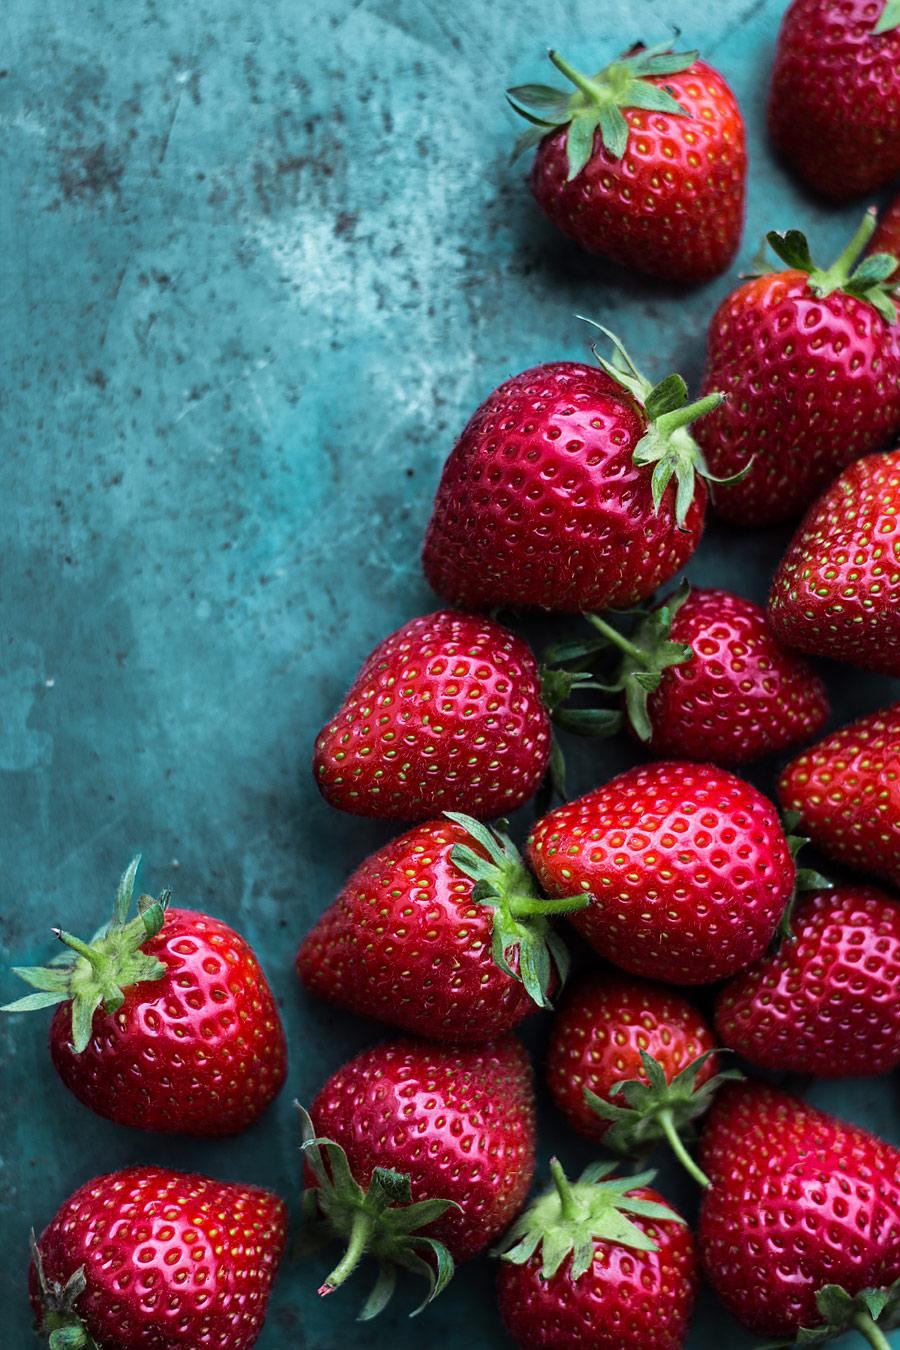 Strawberries by Laura Domingo